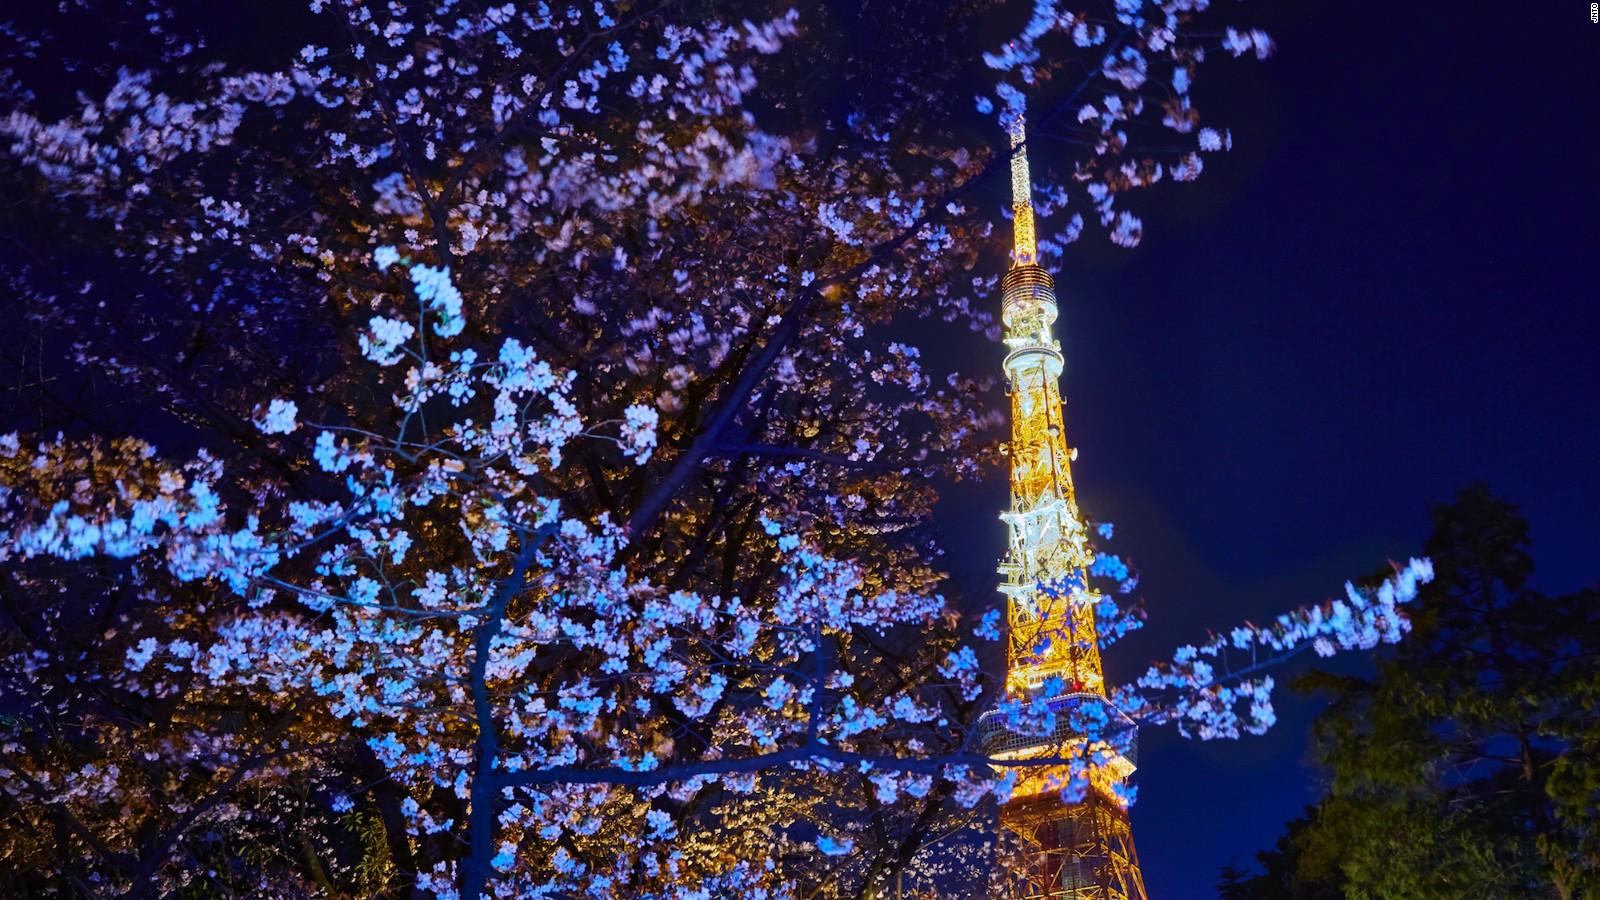 Wonderful Wallpaper Night Cherry Blossom - 170301155809-cherry-blossoms-tokyo-tower-full-169  Pic.jpg